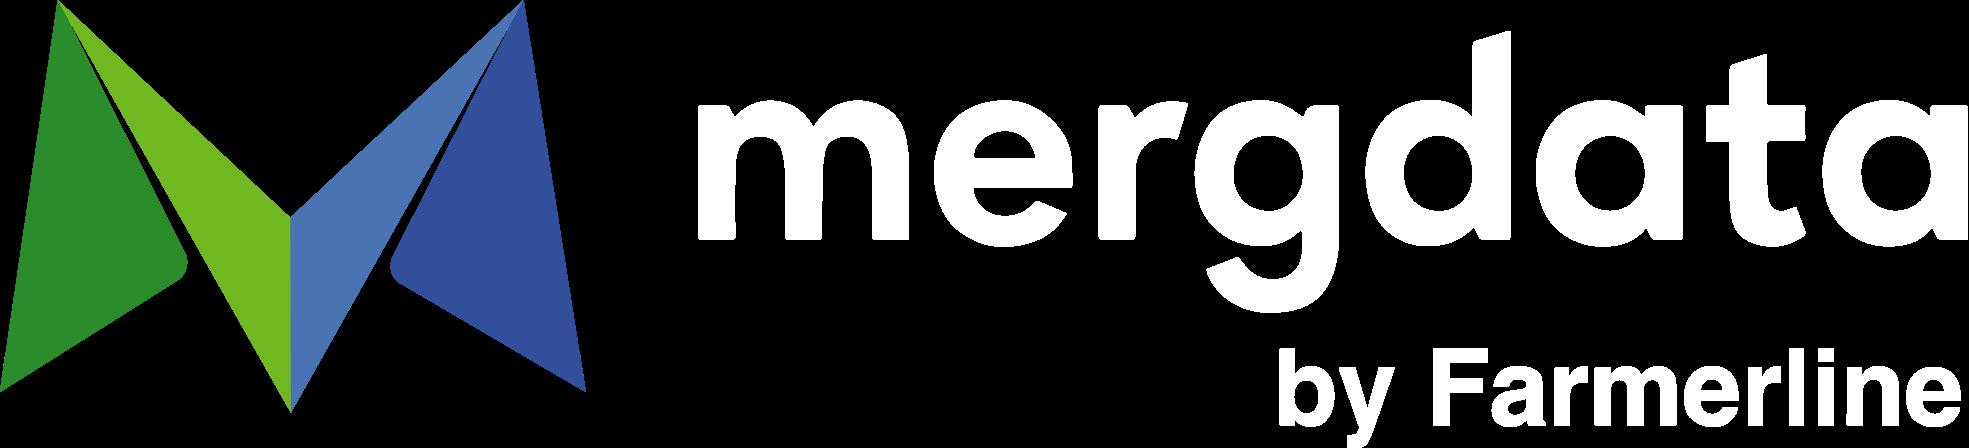 mergdata logo